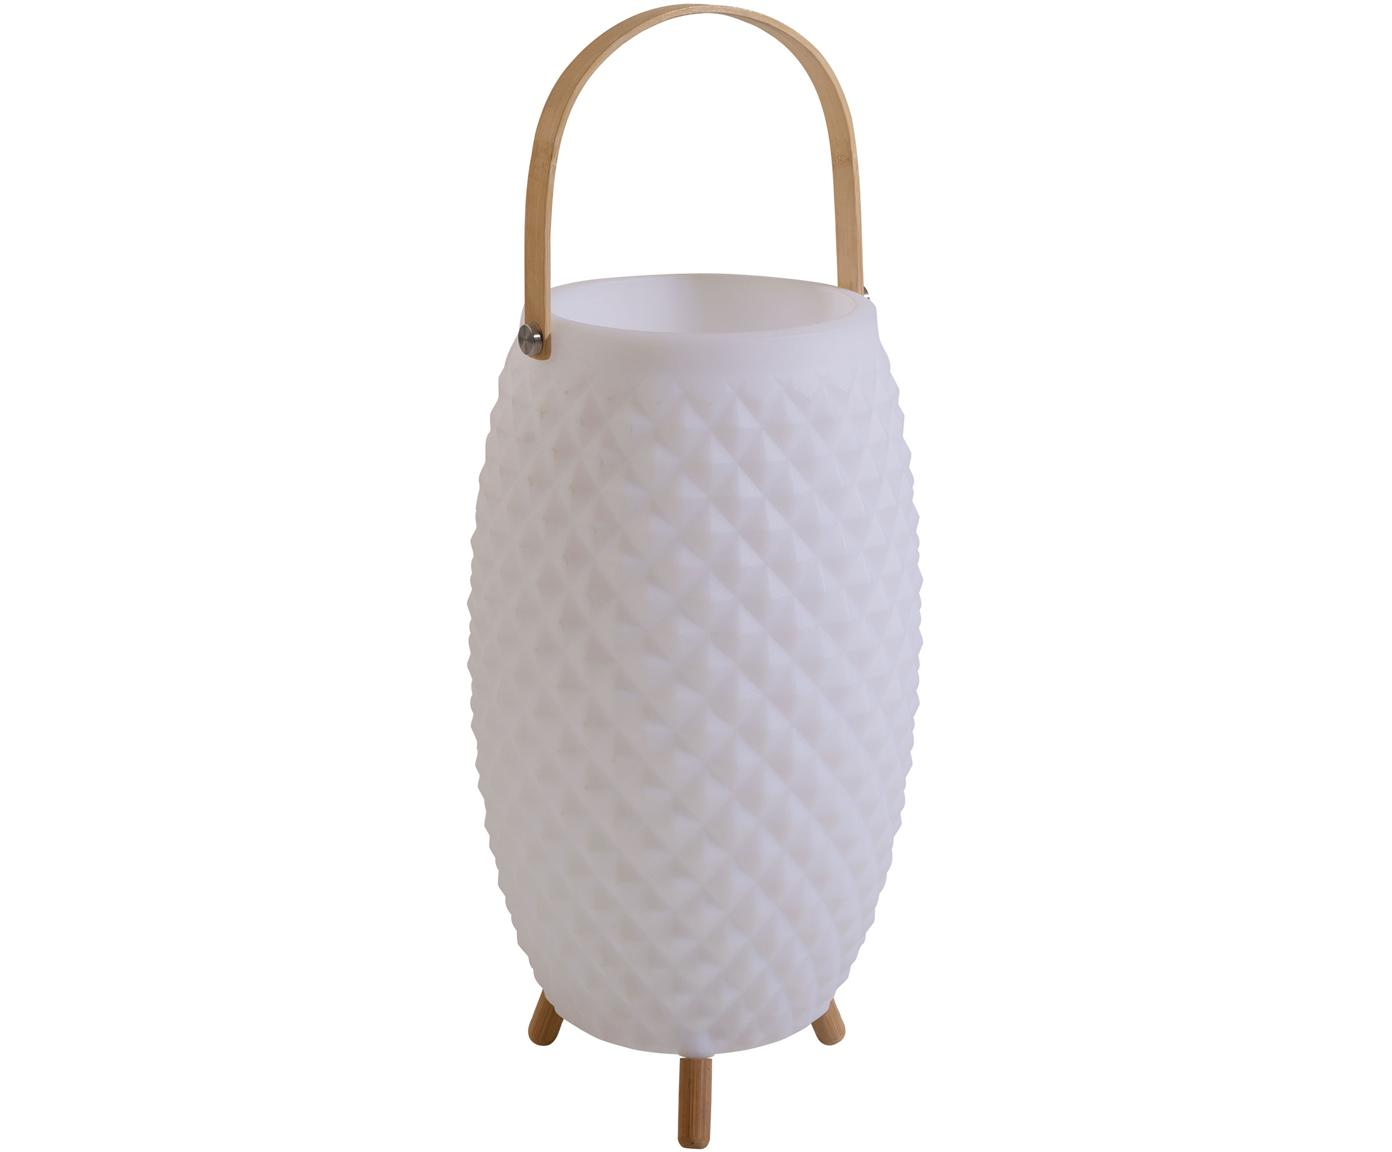 Mobiele outdoor LED lamp Cooldown met luidspreker, Kunststof, rubberhout, Wit, Ø 25 x H 60 cm